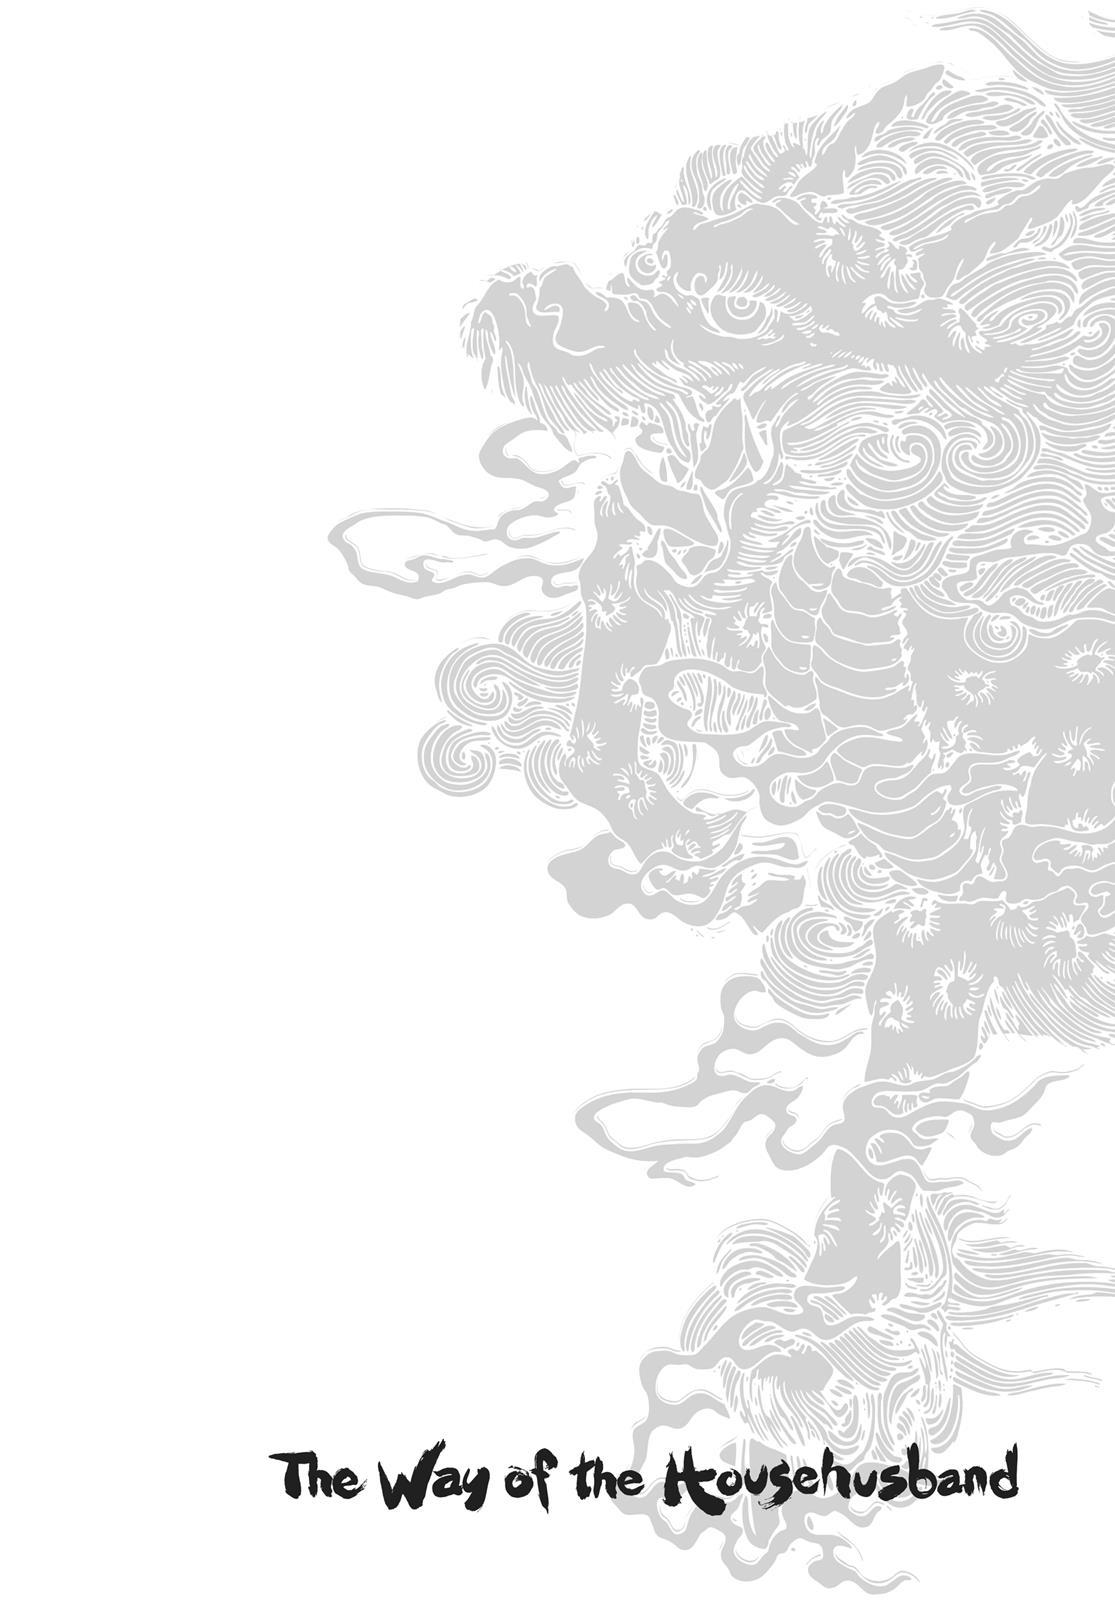 gokushufudou,the way of the househusband,the way of the house husband chapter 6,the way of the house husband chapter 4,wattpad arranged marriage,arrogant husband stories wattpad,angel densetsu,the beast husband chapter 5,always my real husband,ojisama to neko,nyankees,oono kousuke,way of the house husband tv tropes,the way of the house husband barnes and noble,immortal tatsu,the way of the house husband amazon,the way of the house husband reddit,the way of the house husband wiki,way of the house husband reddit,the way of the house husband,oono kousuke twitter,the way of the house husband chapter 2,golden kamuy tv tropes,tv tropes retired badass,comically small bribe,komi can't communicate